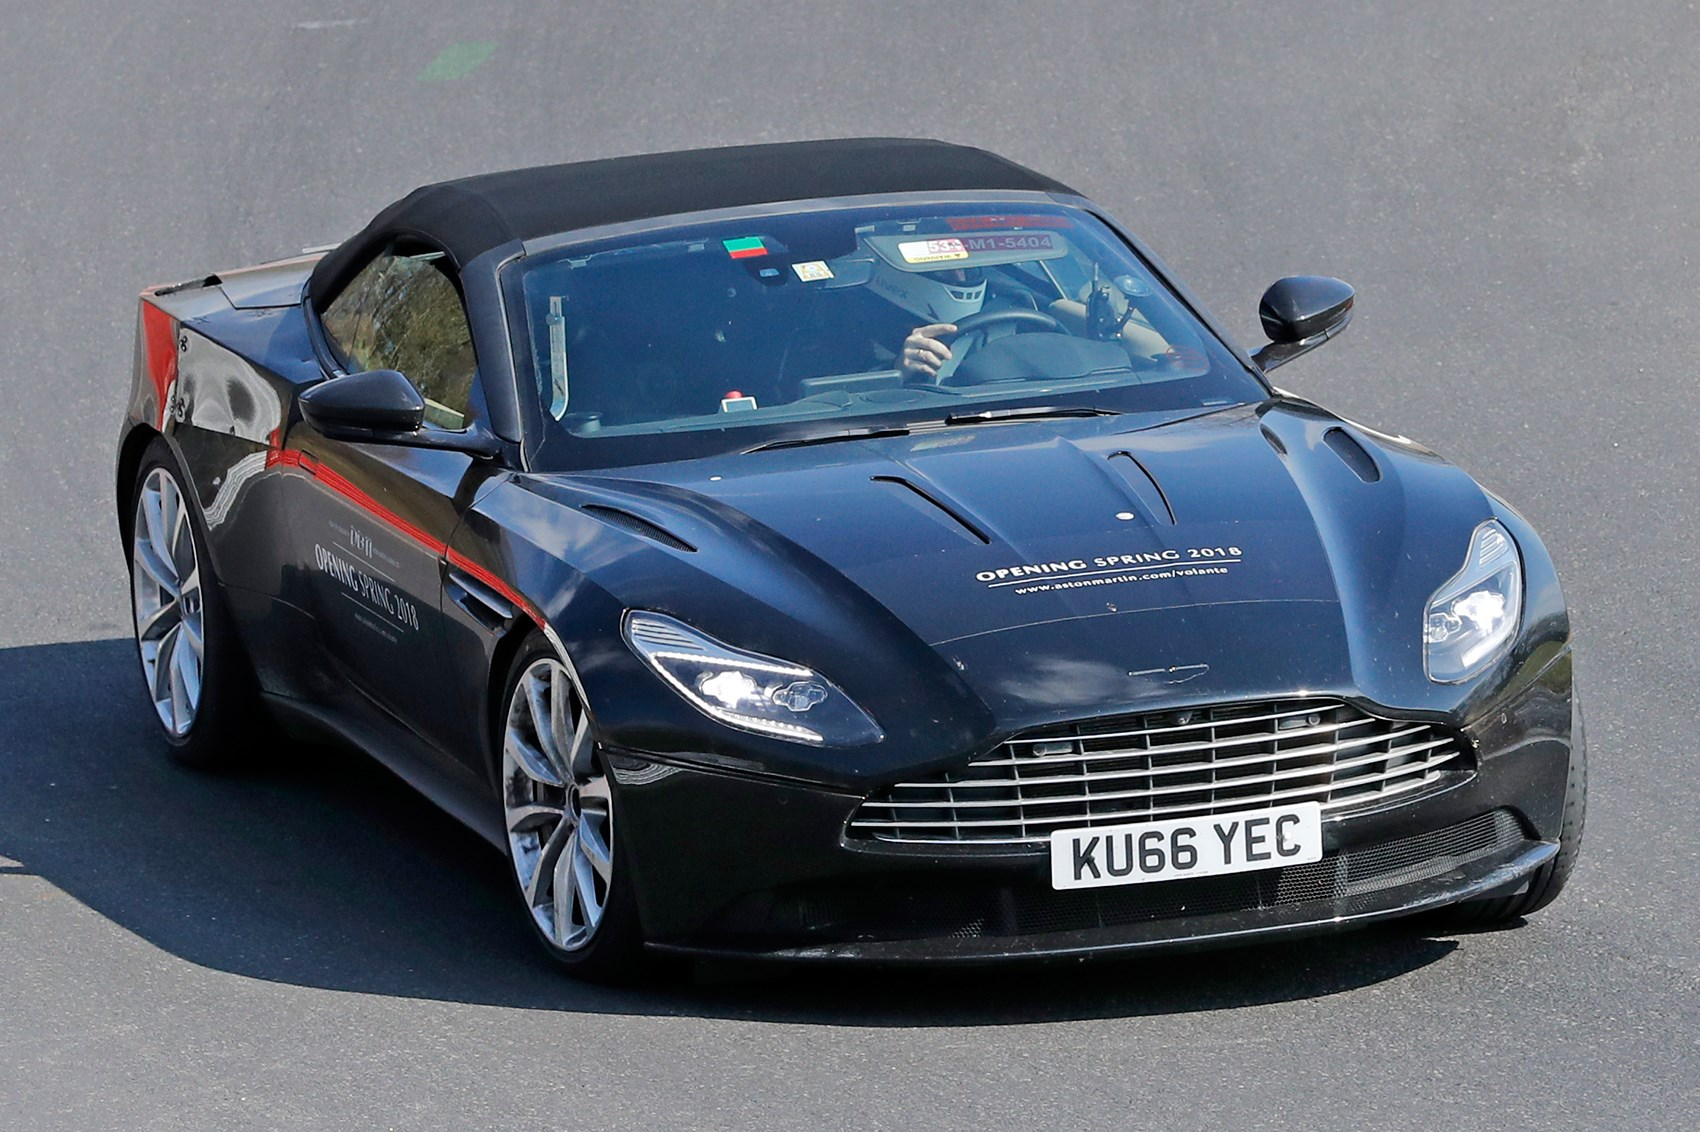 When prototypes become mobile billboards: Aston Martin DB11 Volante